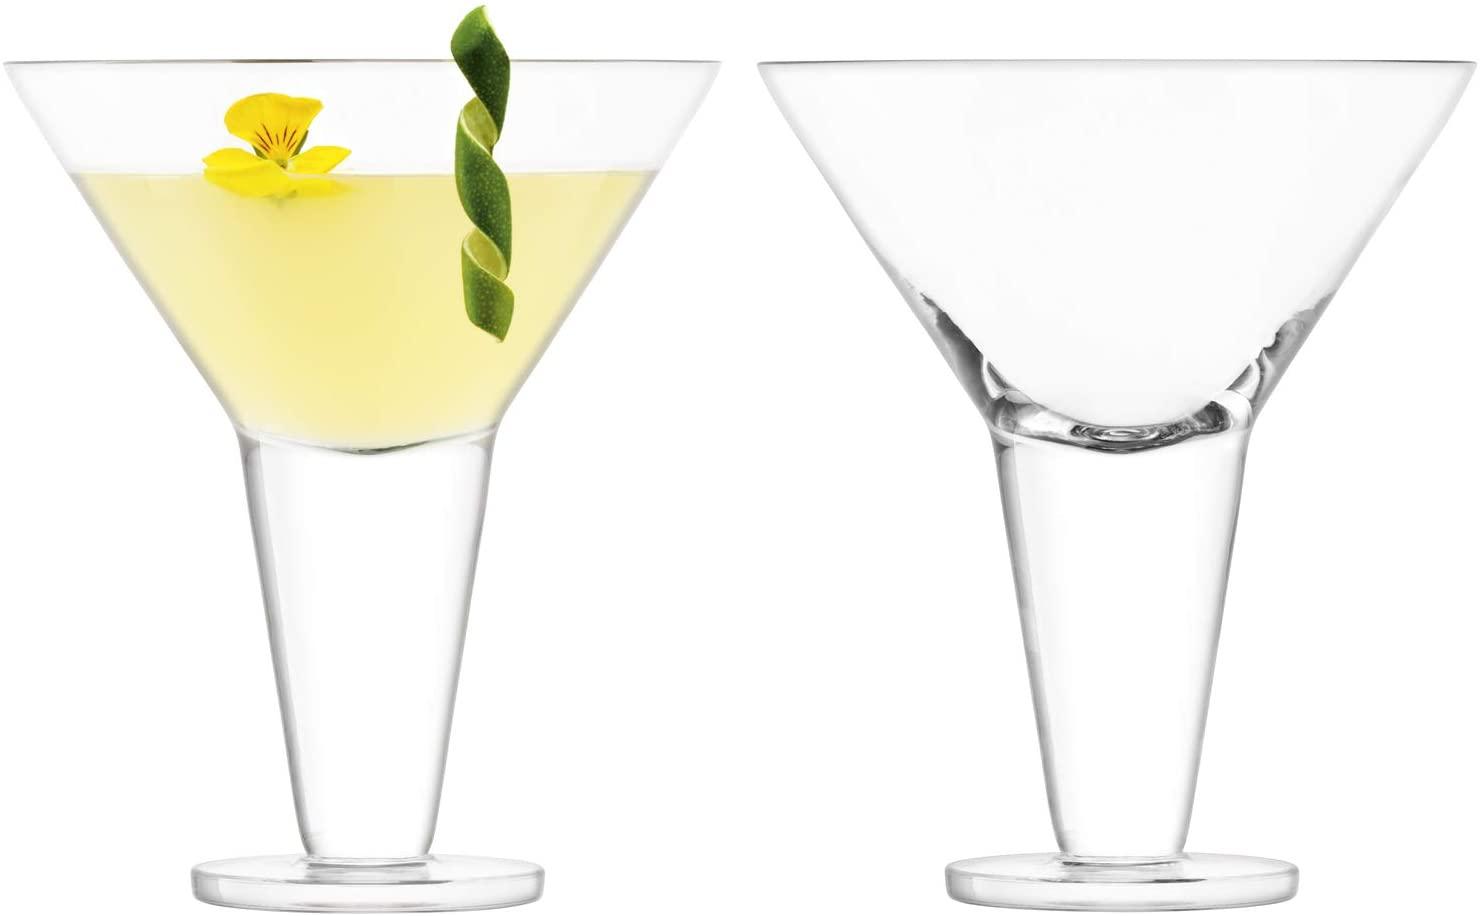 LSA International Rum Cocktail Glass, 10.1 fl oz, Clear